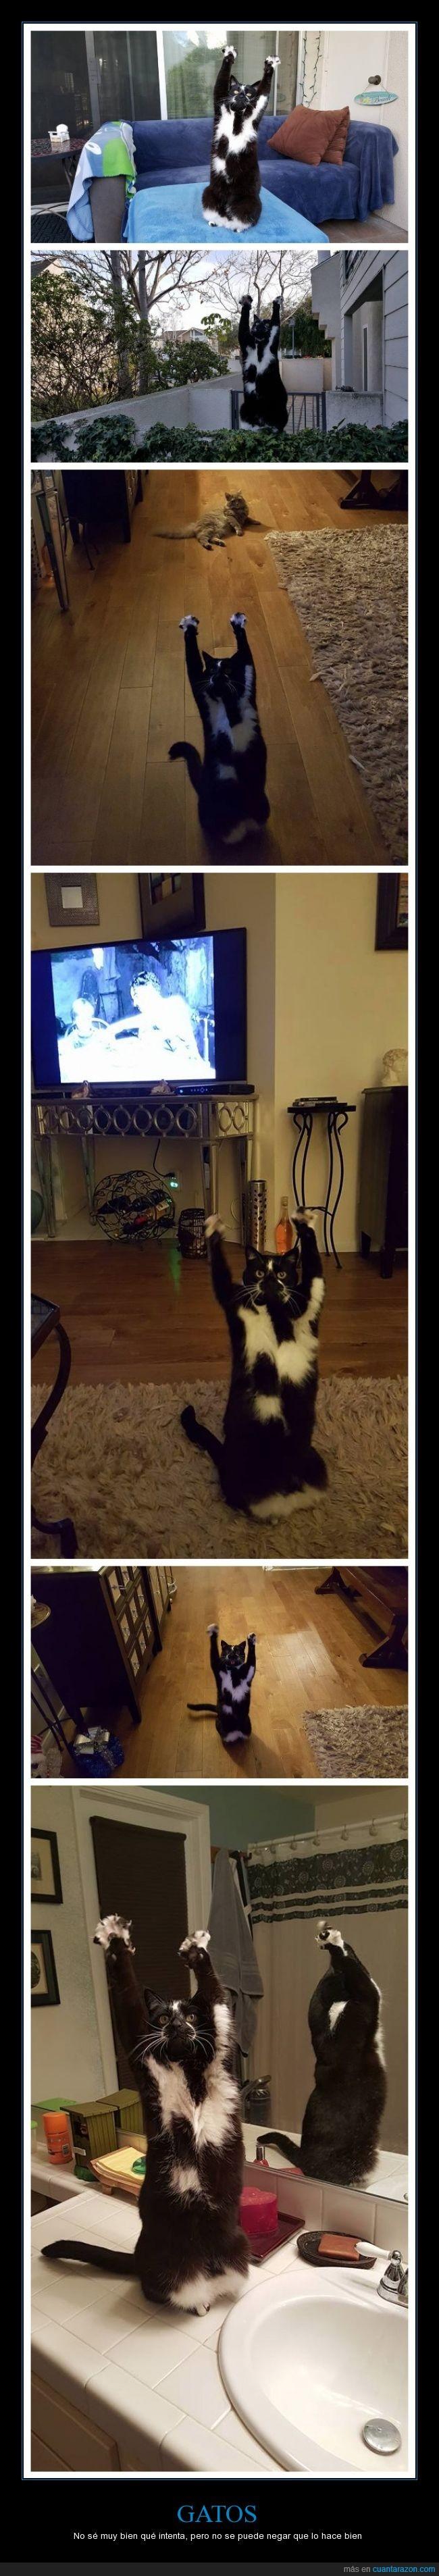 arriba,blanco,cielo,gato,levantar,negro,patas